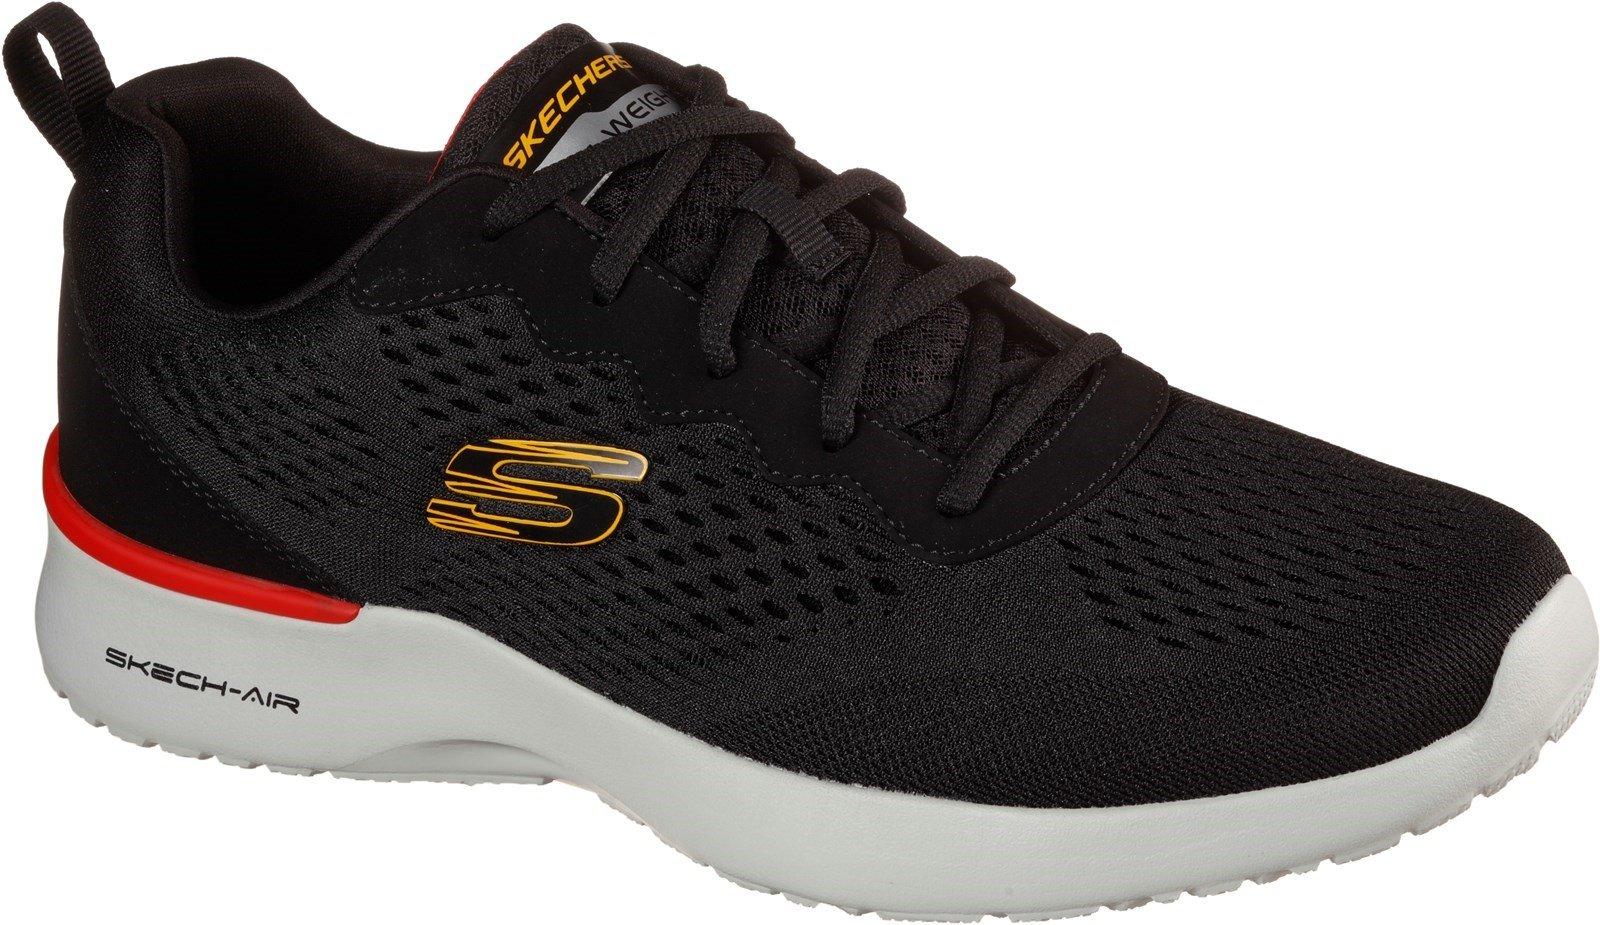 Skechers Men's Skech-Air Dynamight Sports Trainer Various Colours 32186 - Black/Black 6